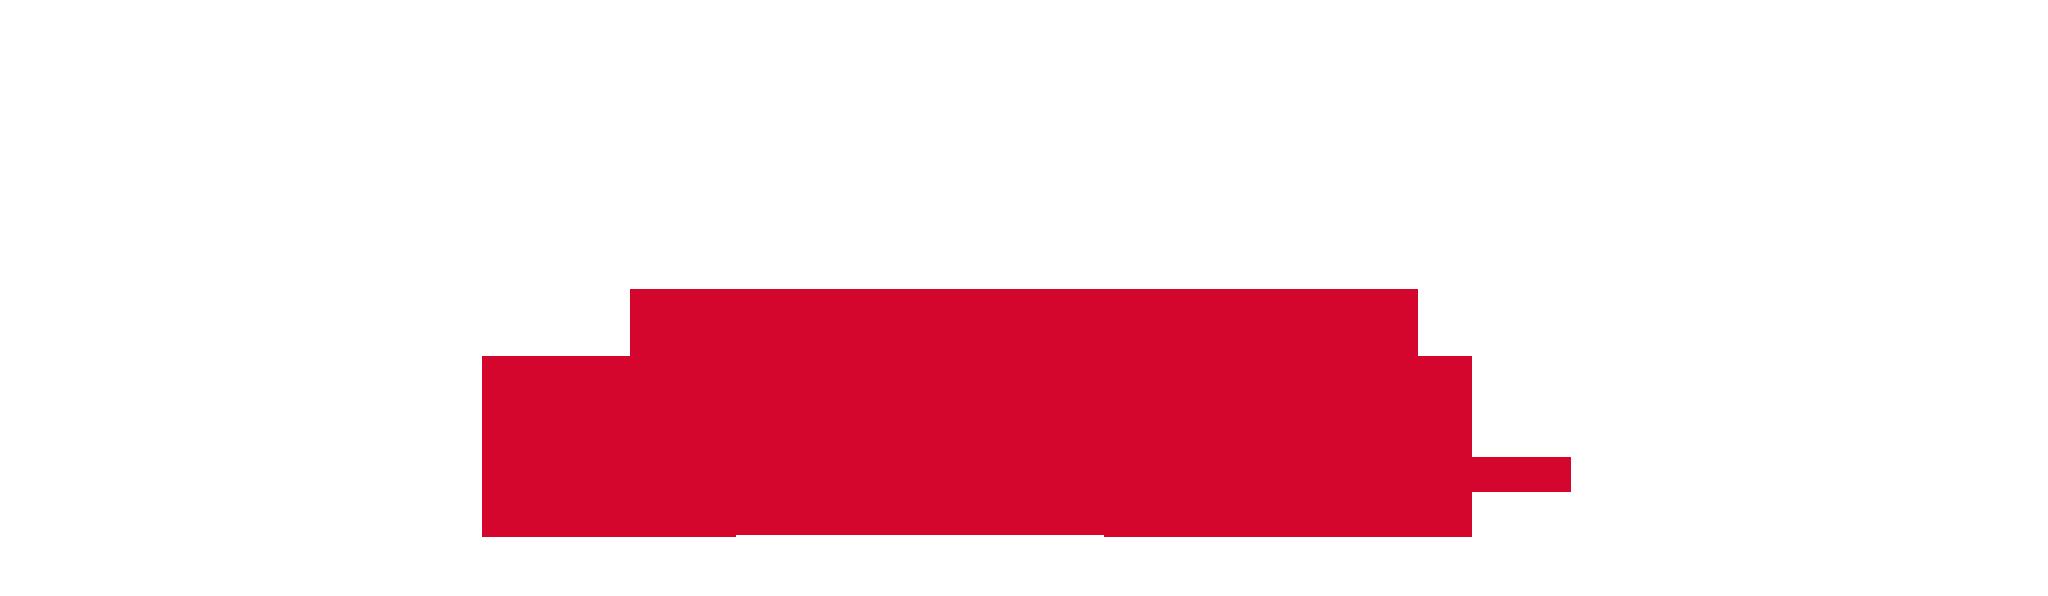 2048-596-tab-sp